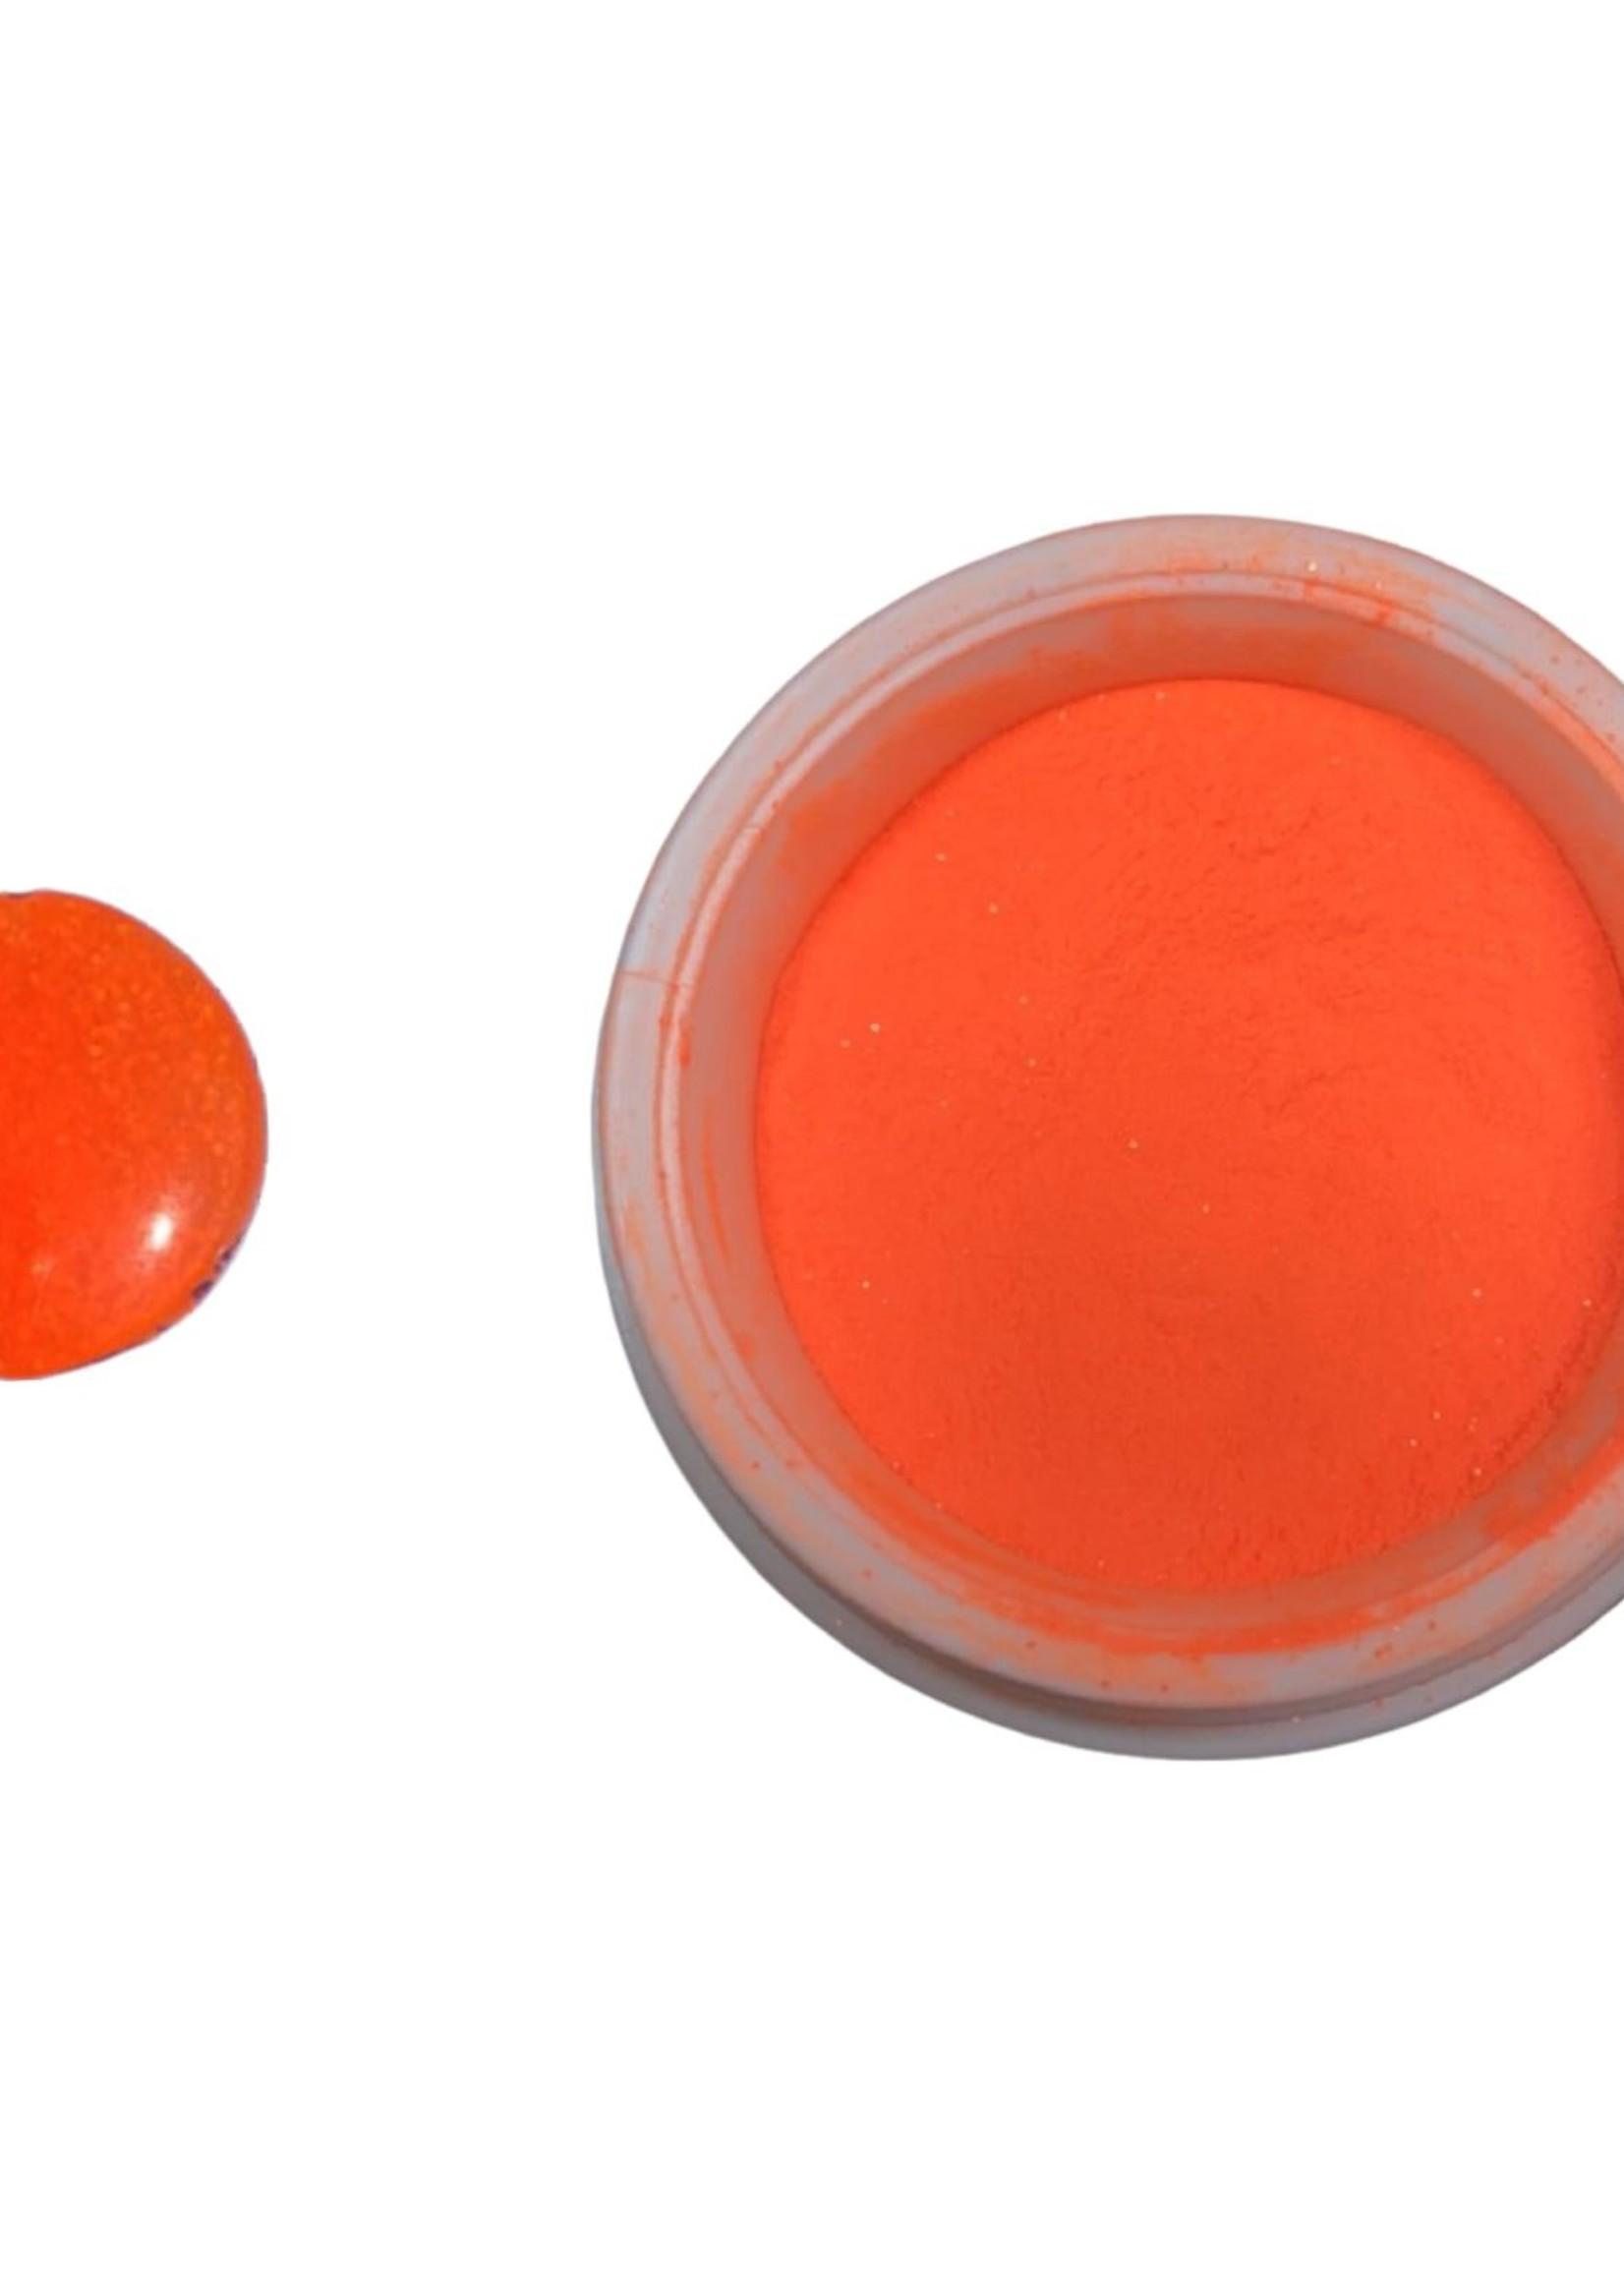 La Ross Neon Oranje Juice